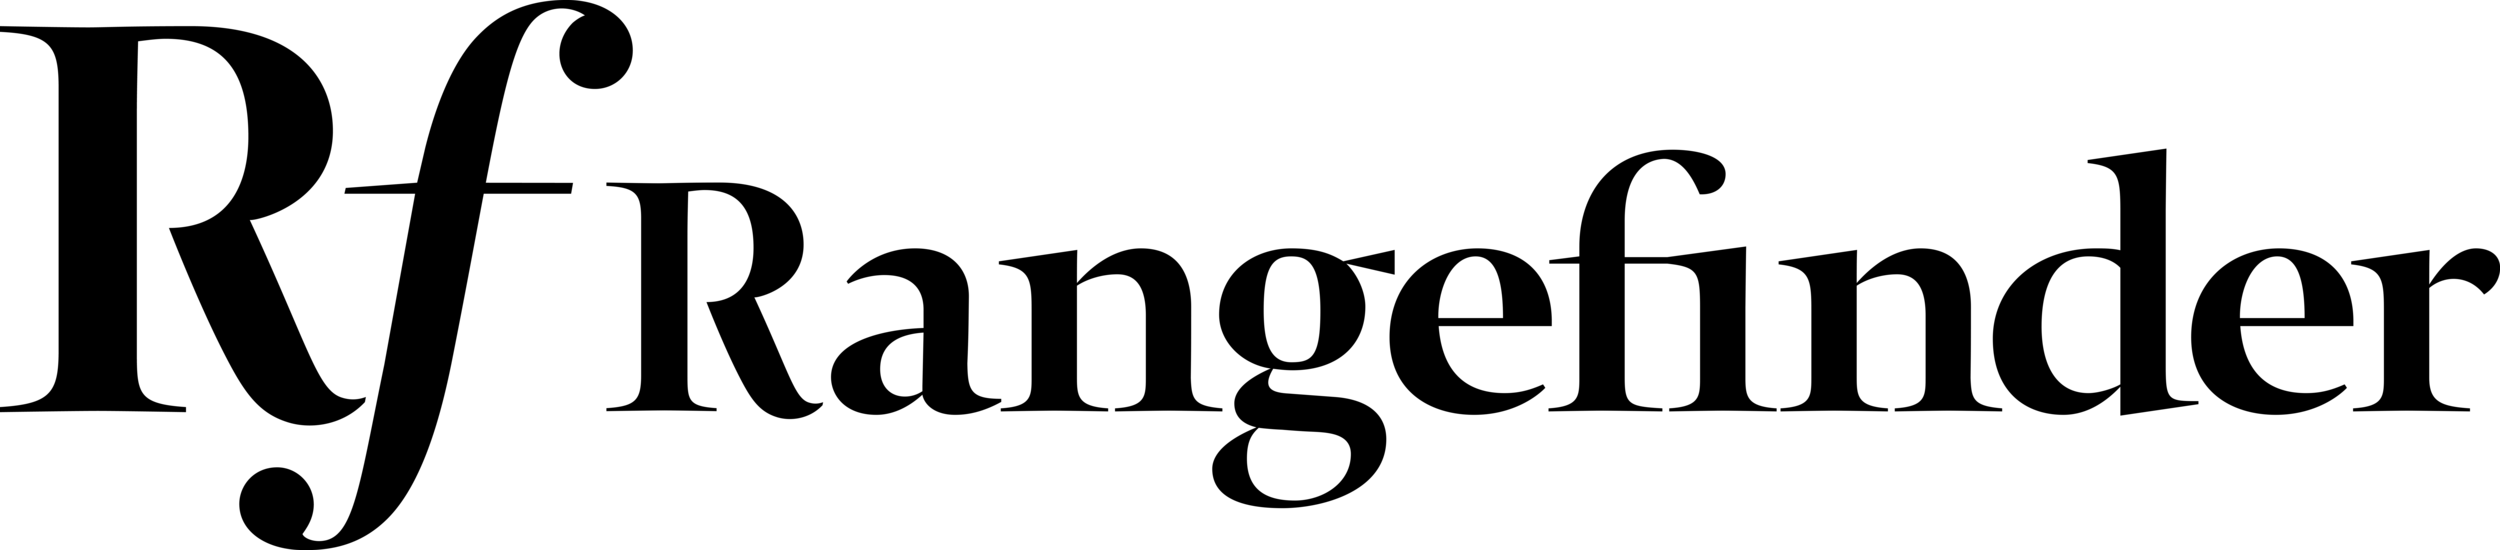 RF Black 300.png